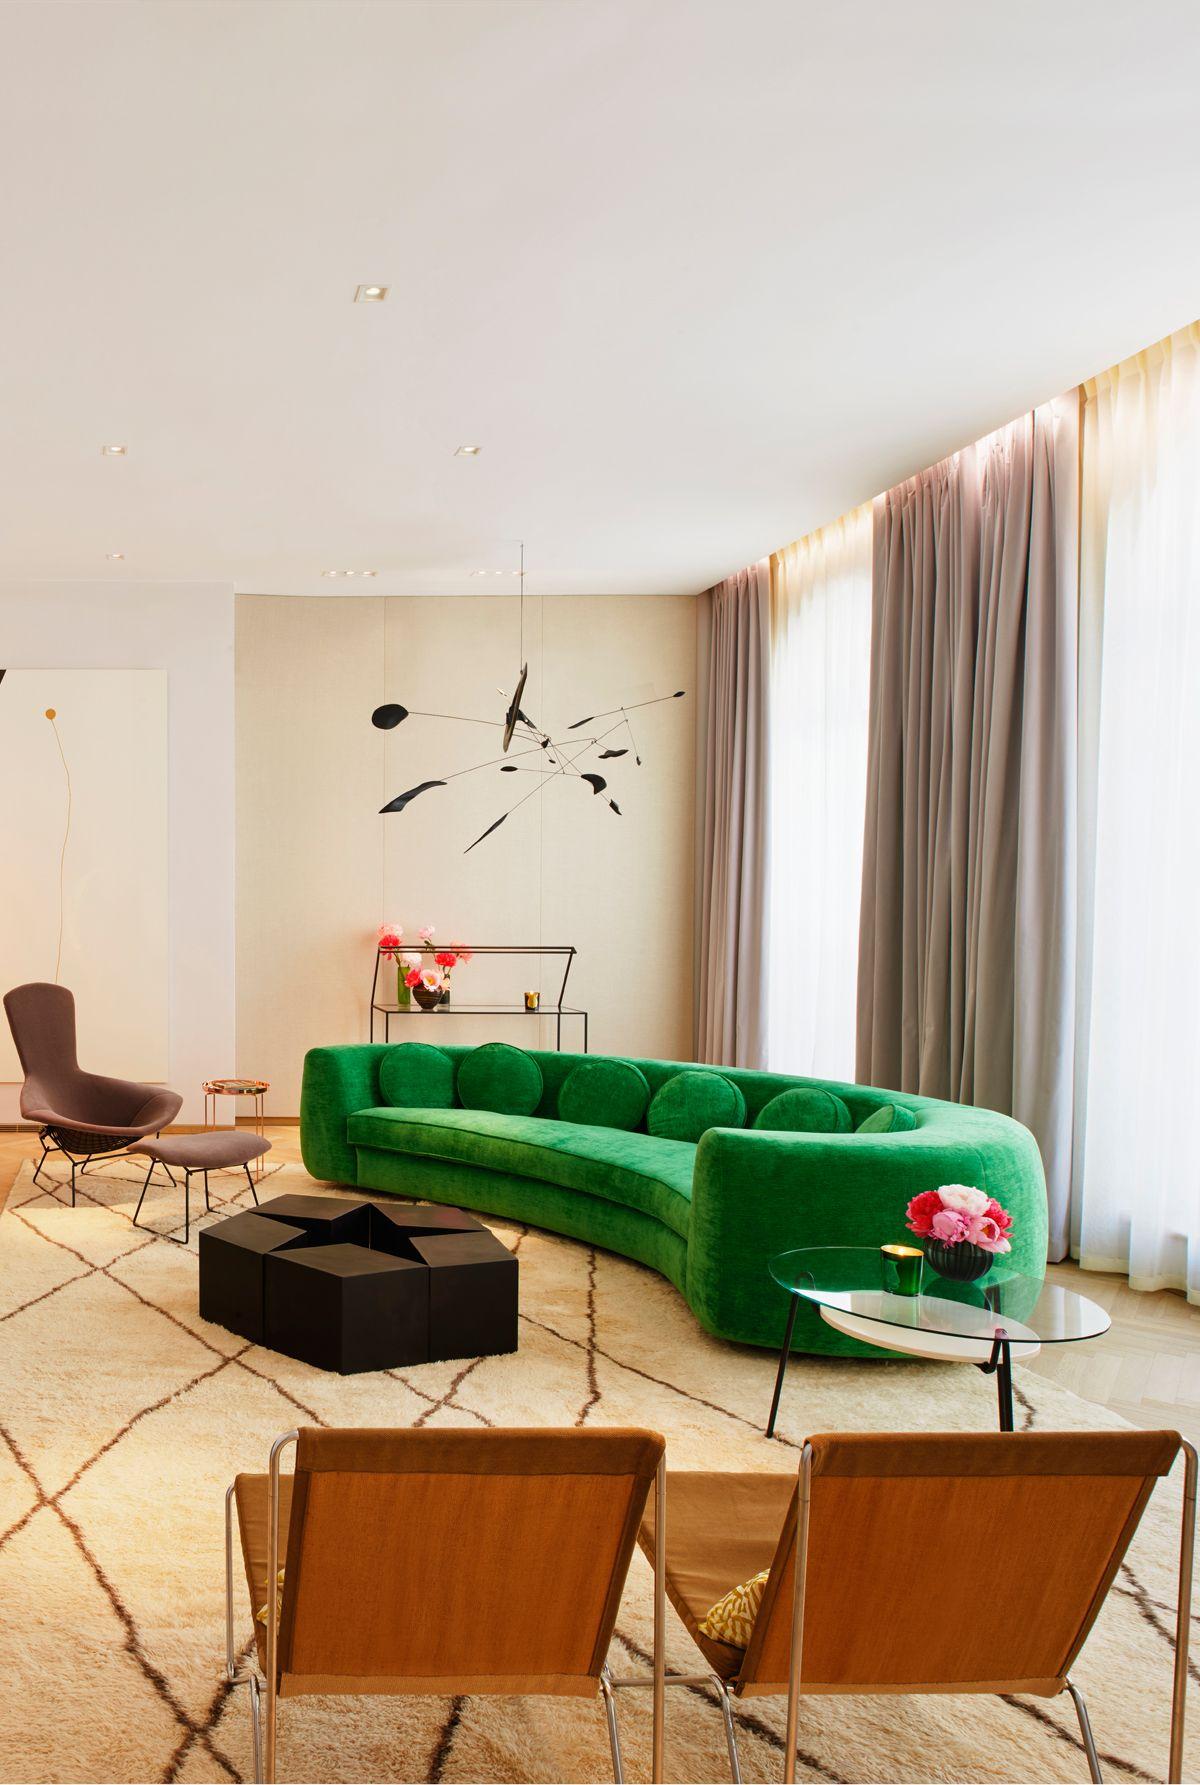 The Mellier Mayfair London Jelly Pea Sofa by India Mahdavi